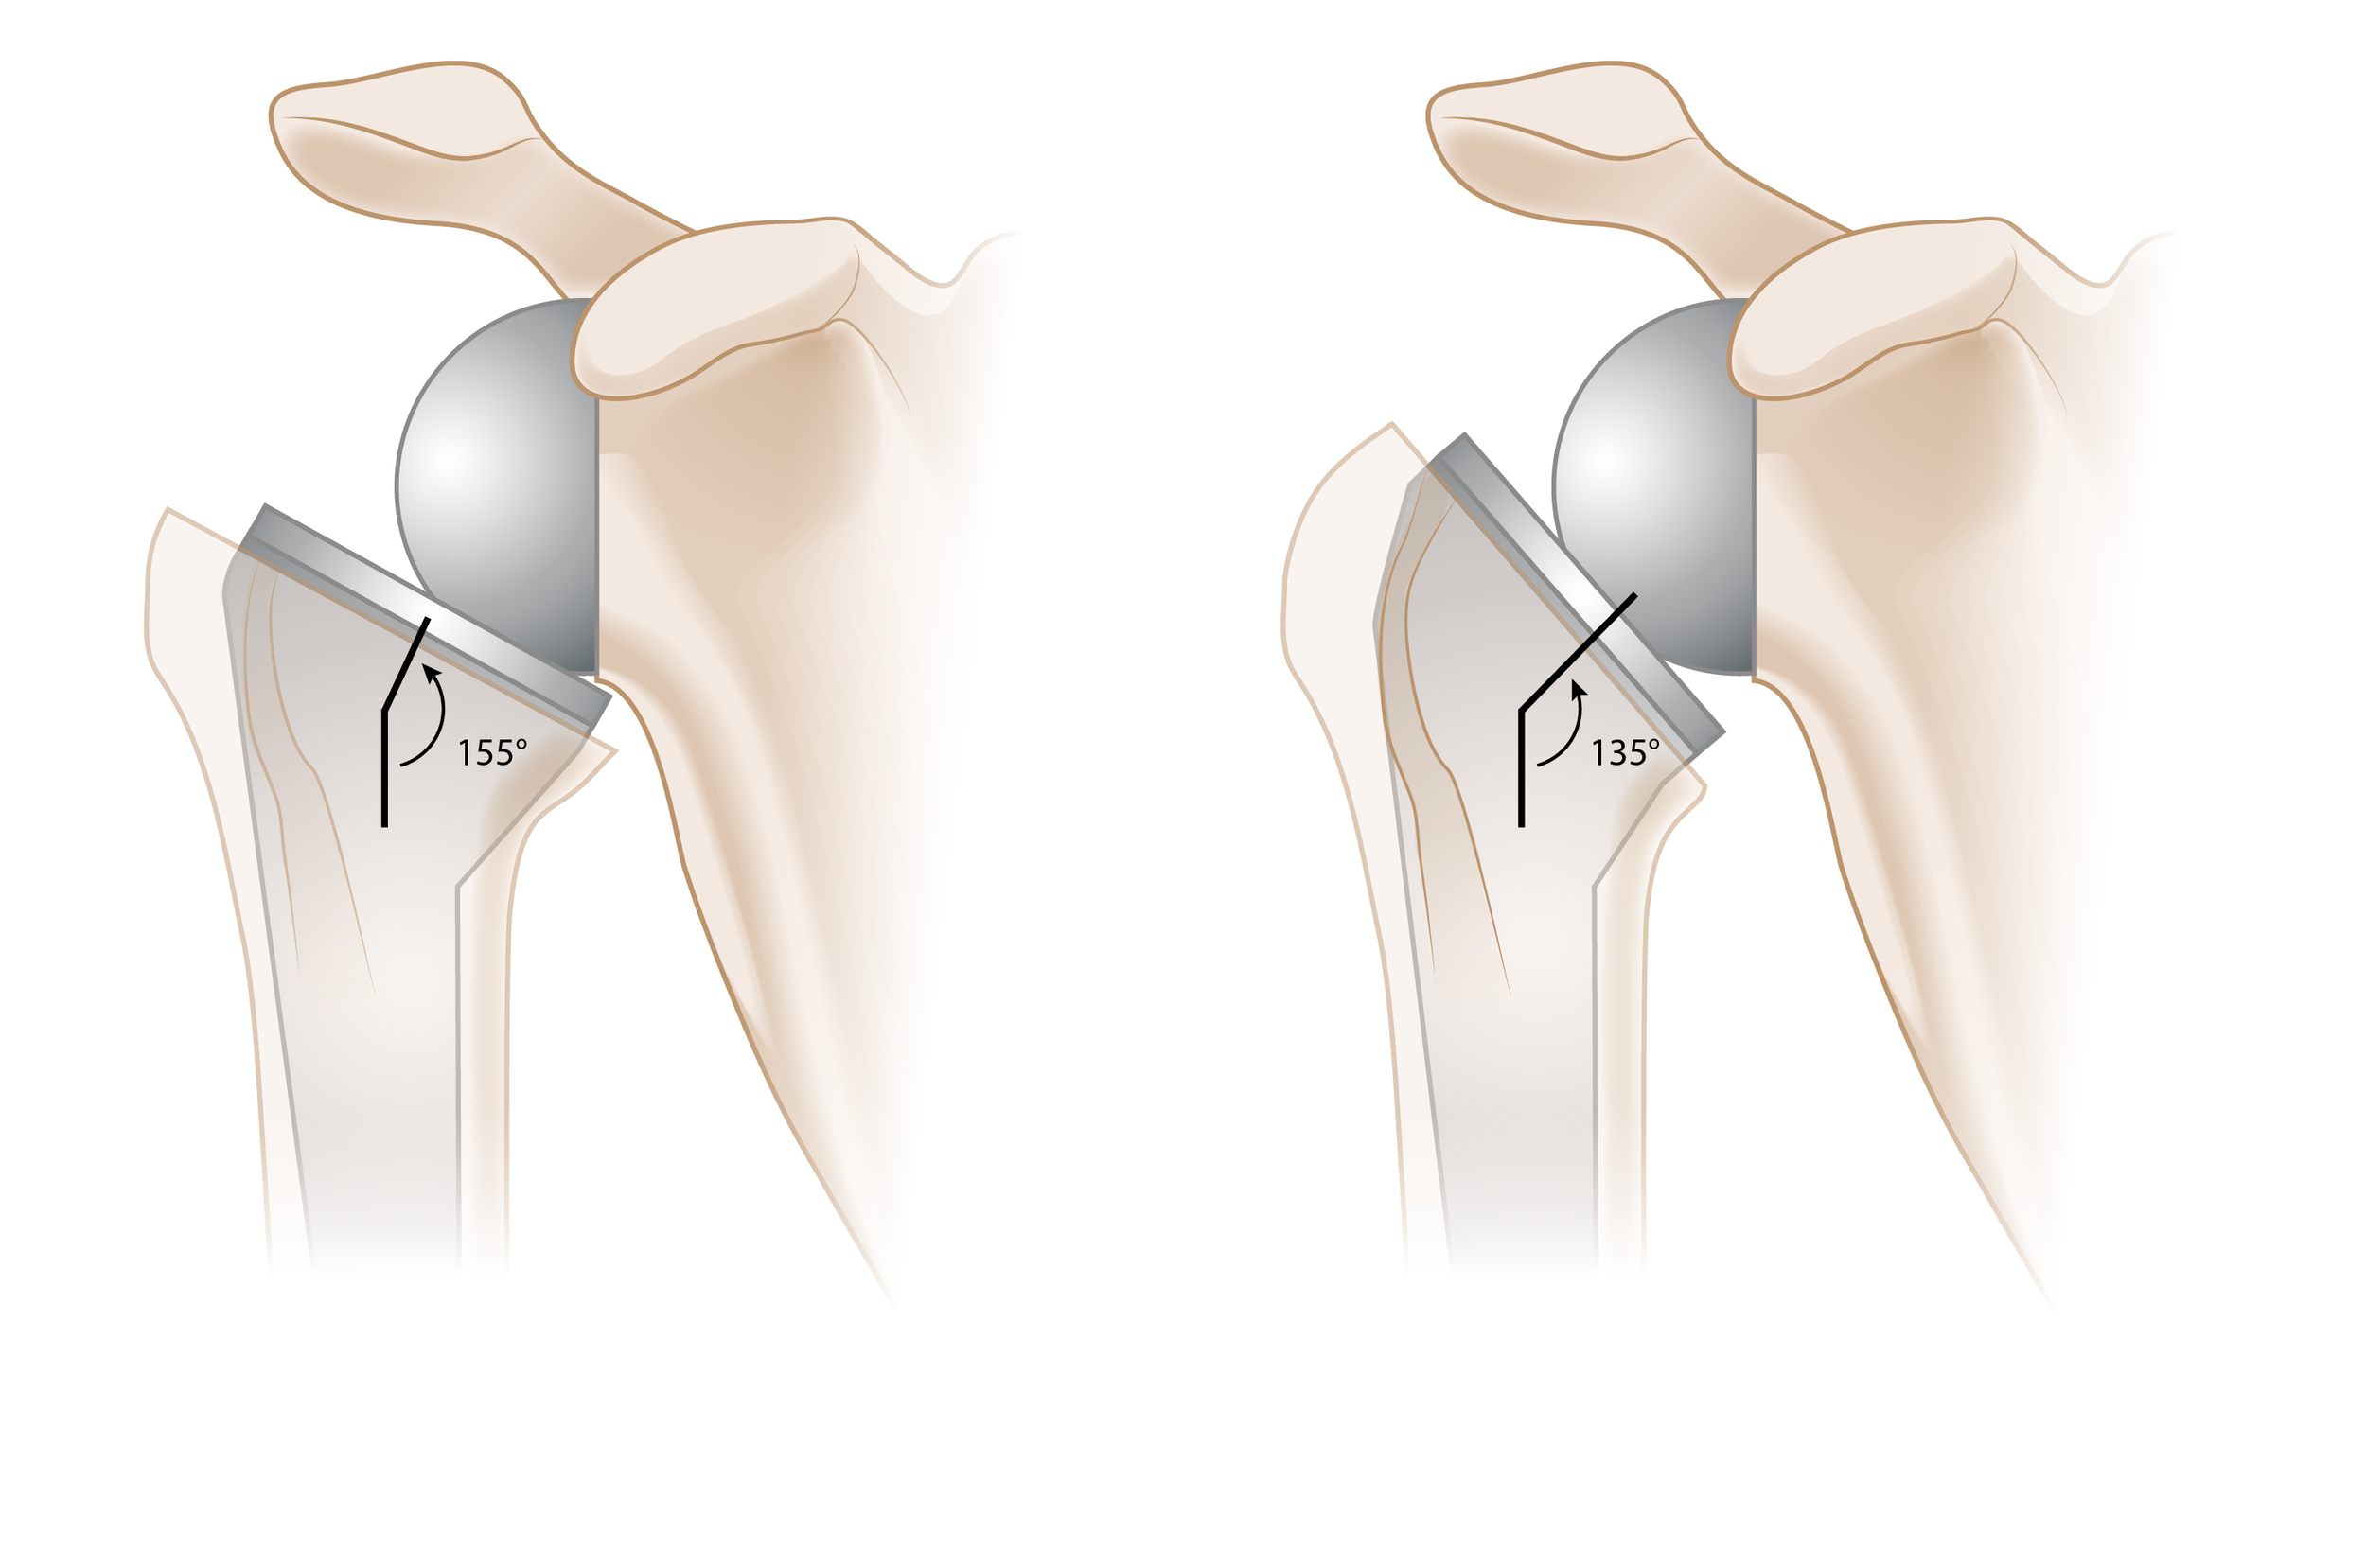 Reverse Shoulder Arthroplasty Prosthesis Comparison